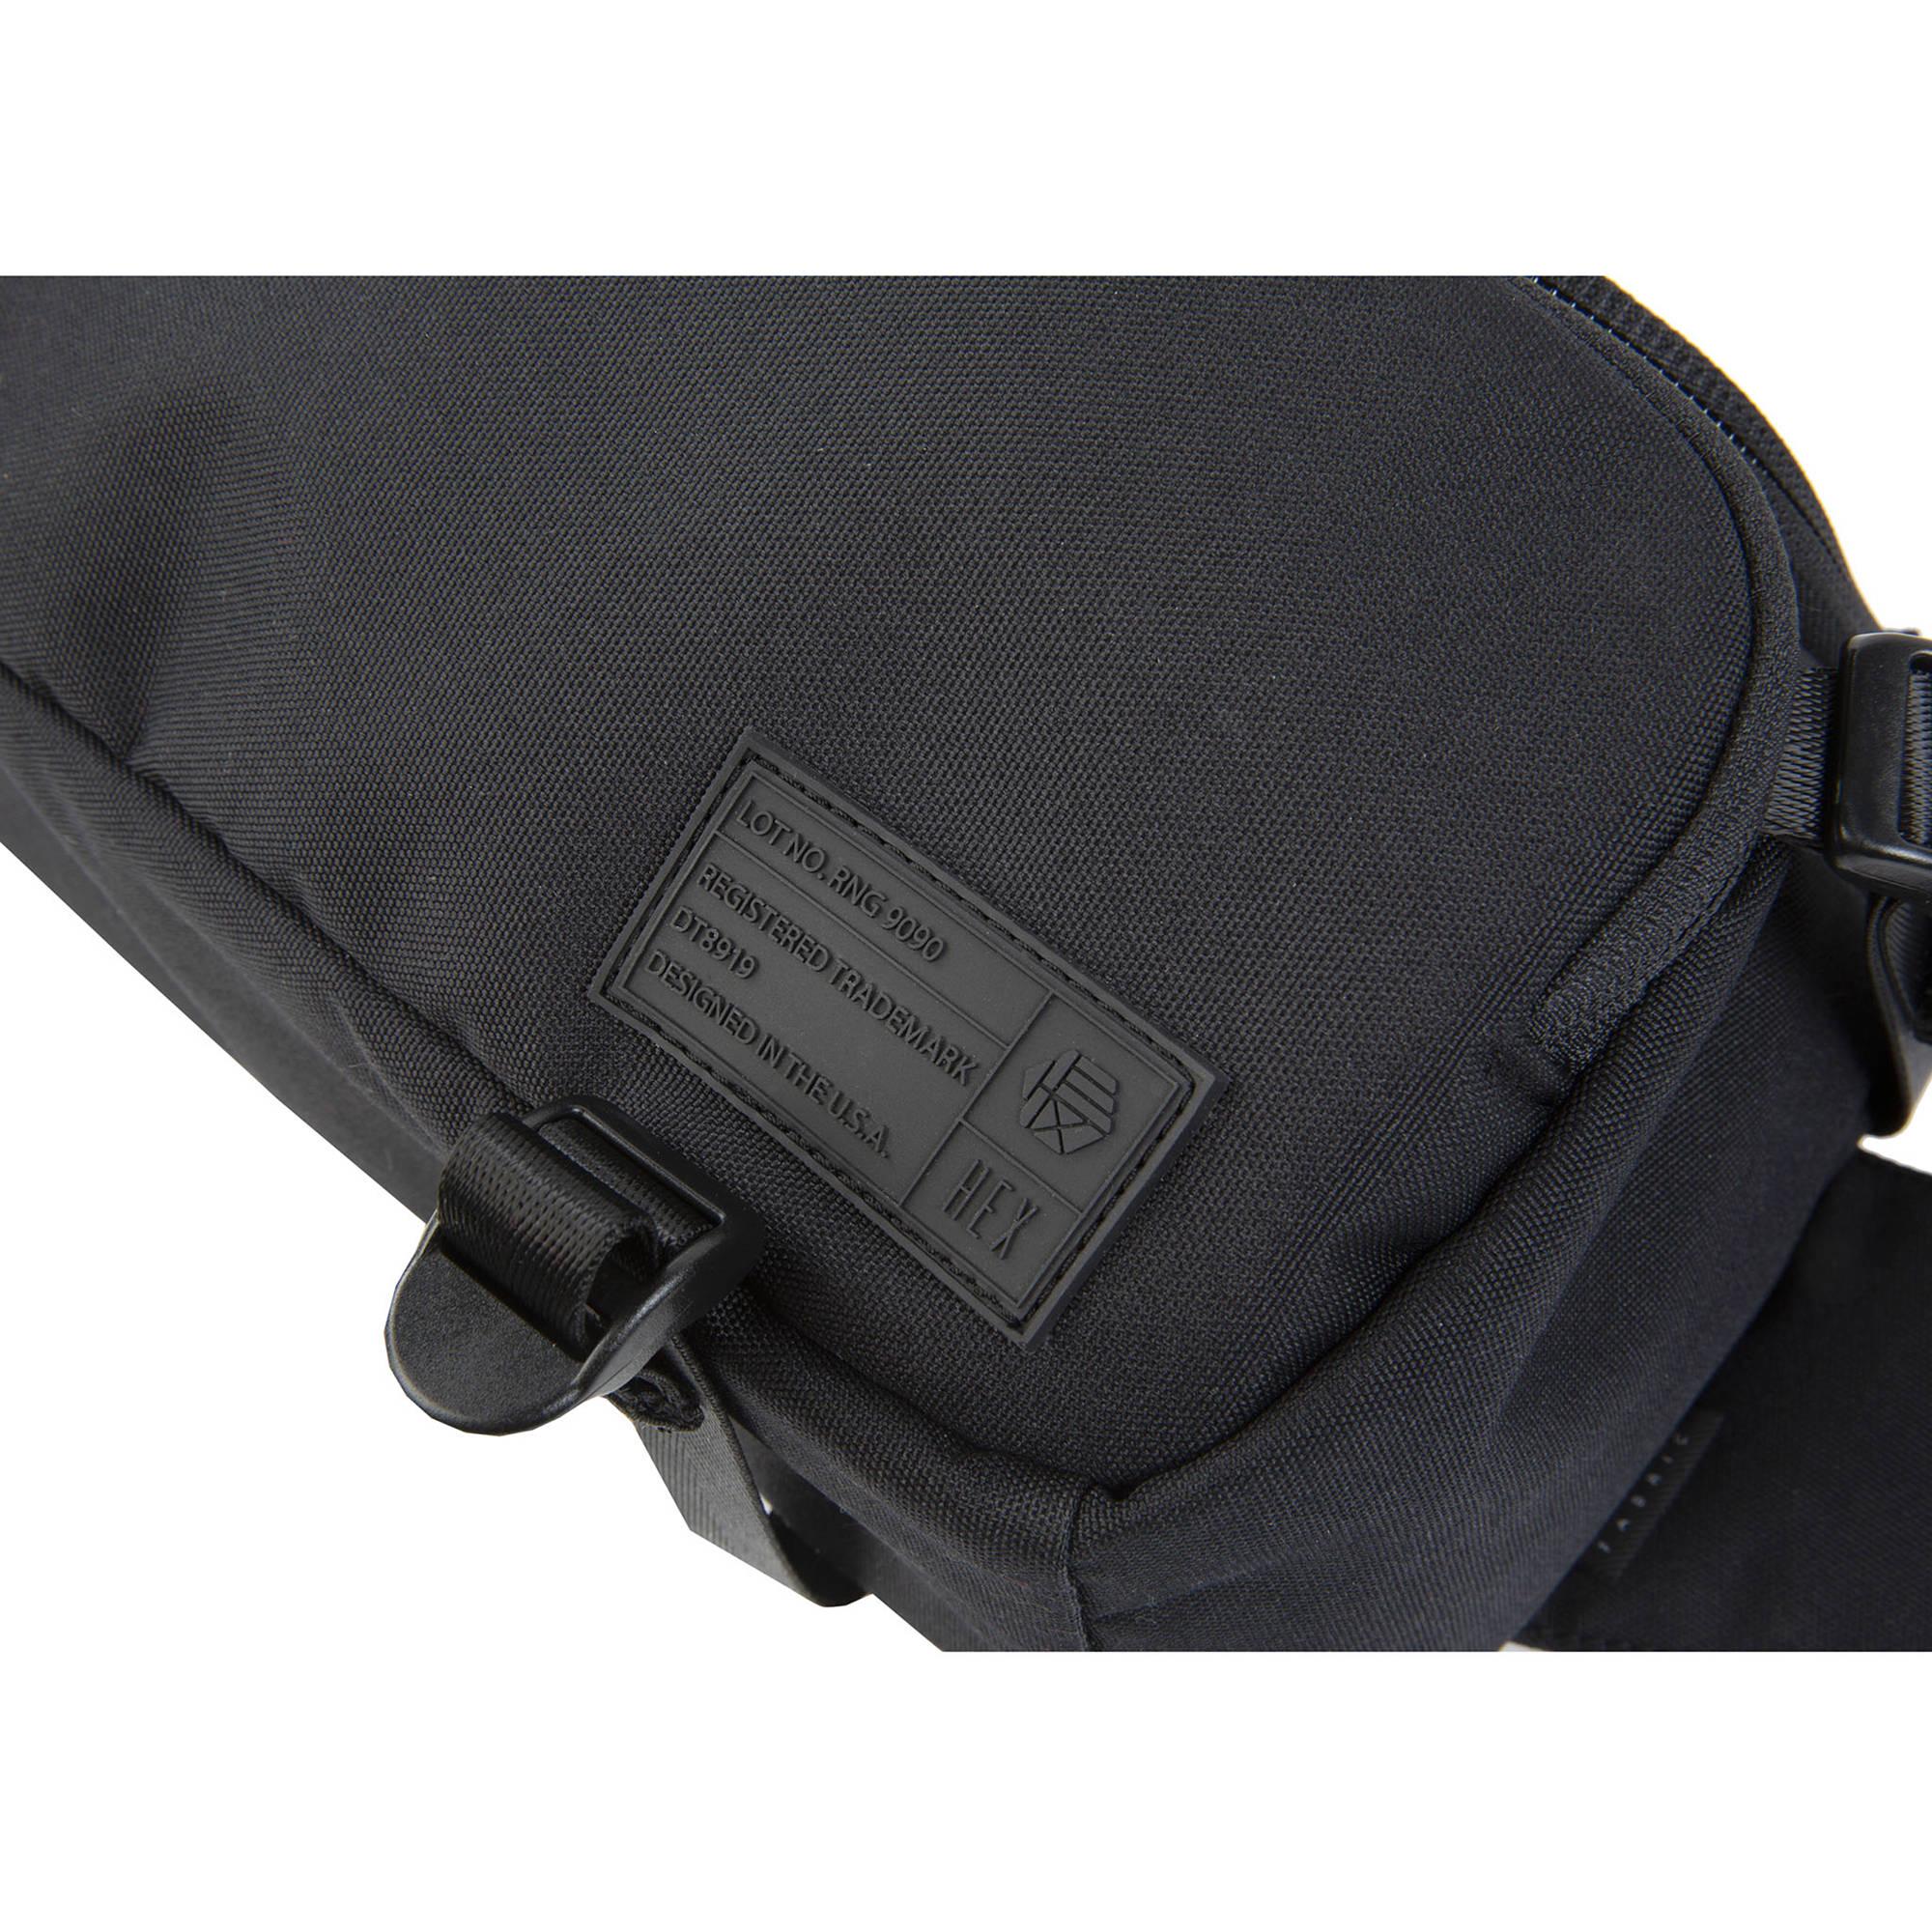 with Adjustable Carry Straps Collapsible Interior Dividers /& More Black Hex Ranger DSLR Sling Black